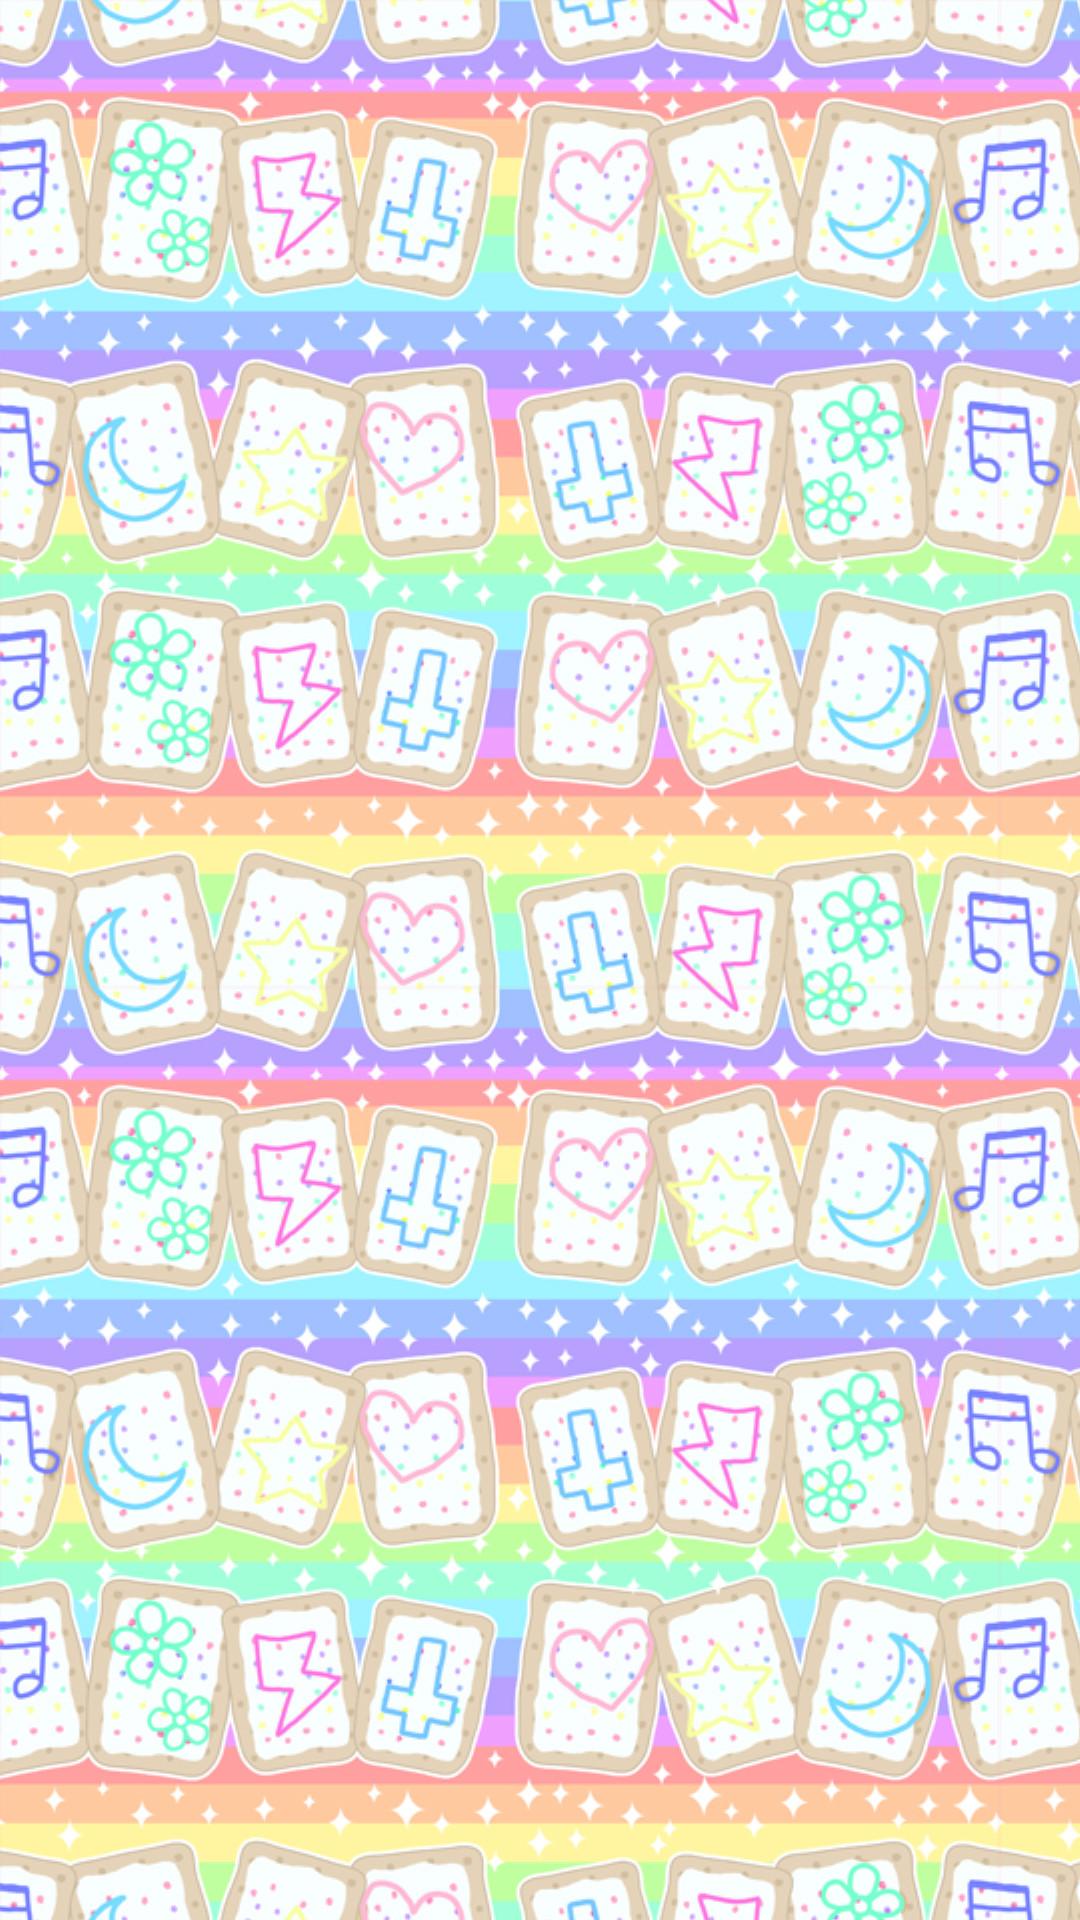 kawaii-Pattern-Wallpapers-iphone-6-by-Blackberyy-themes-